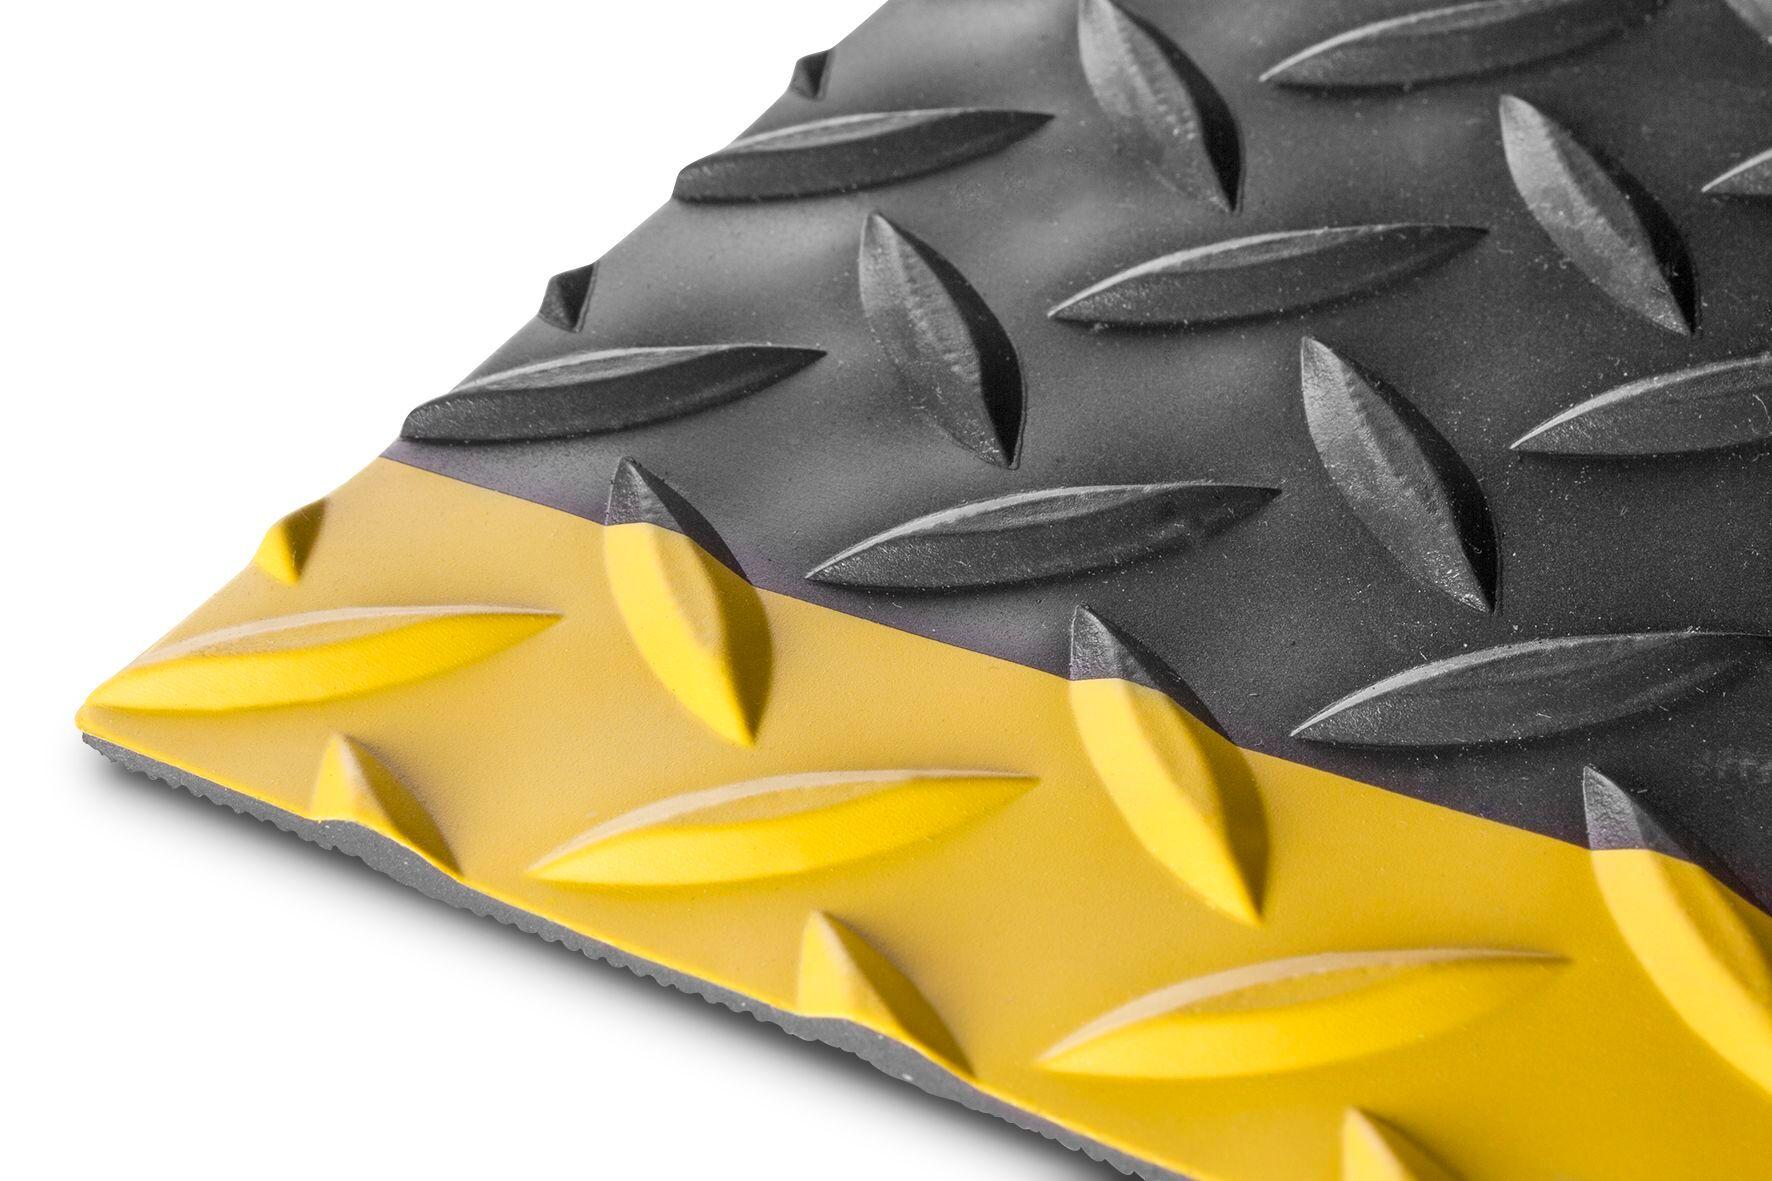 Mw-tools Tapis PVC diamant 22,8m x 0,91m x 4,7mm MW-Tools PVCRB910